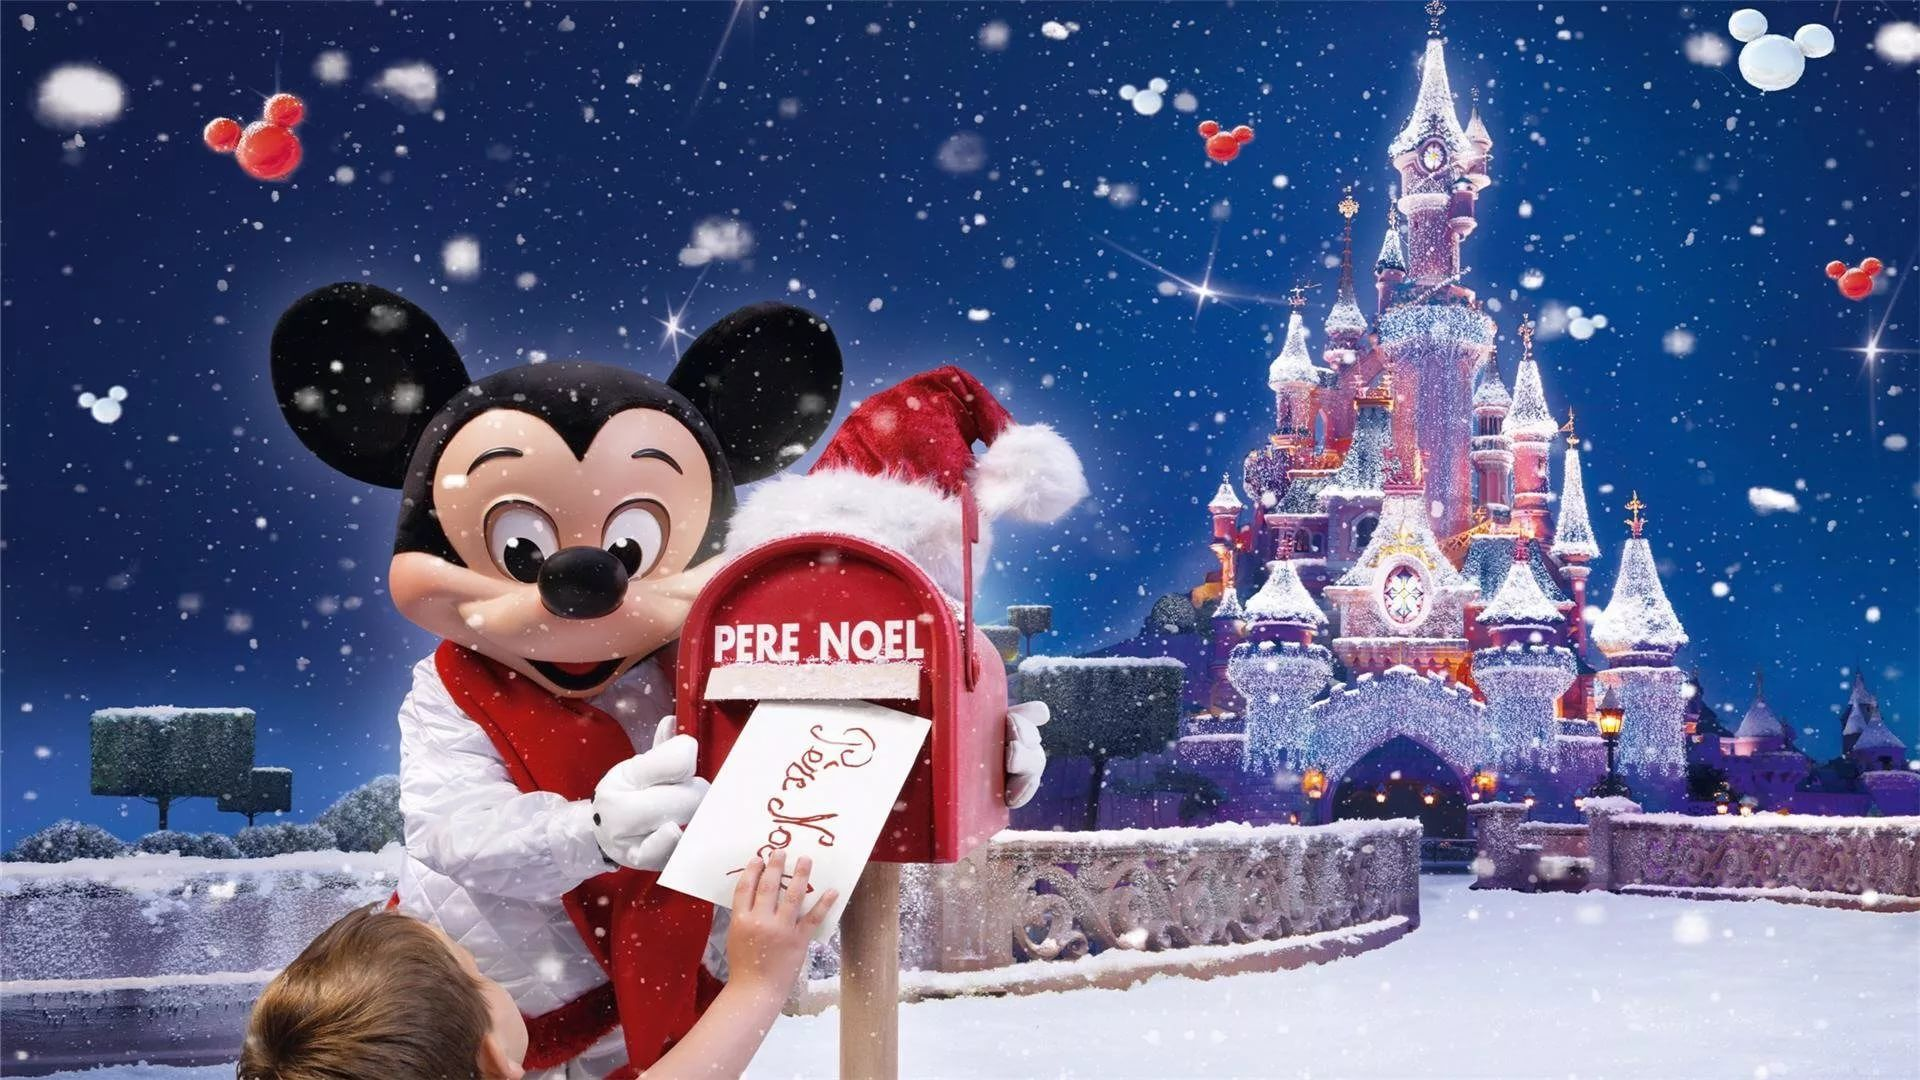 Disney Christmas Image